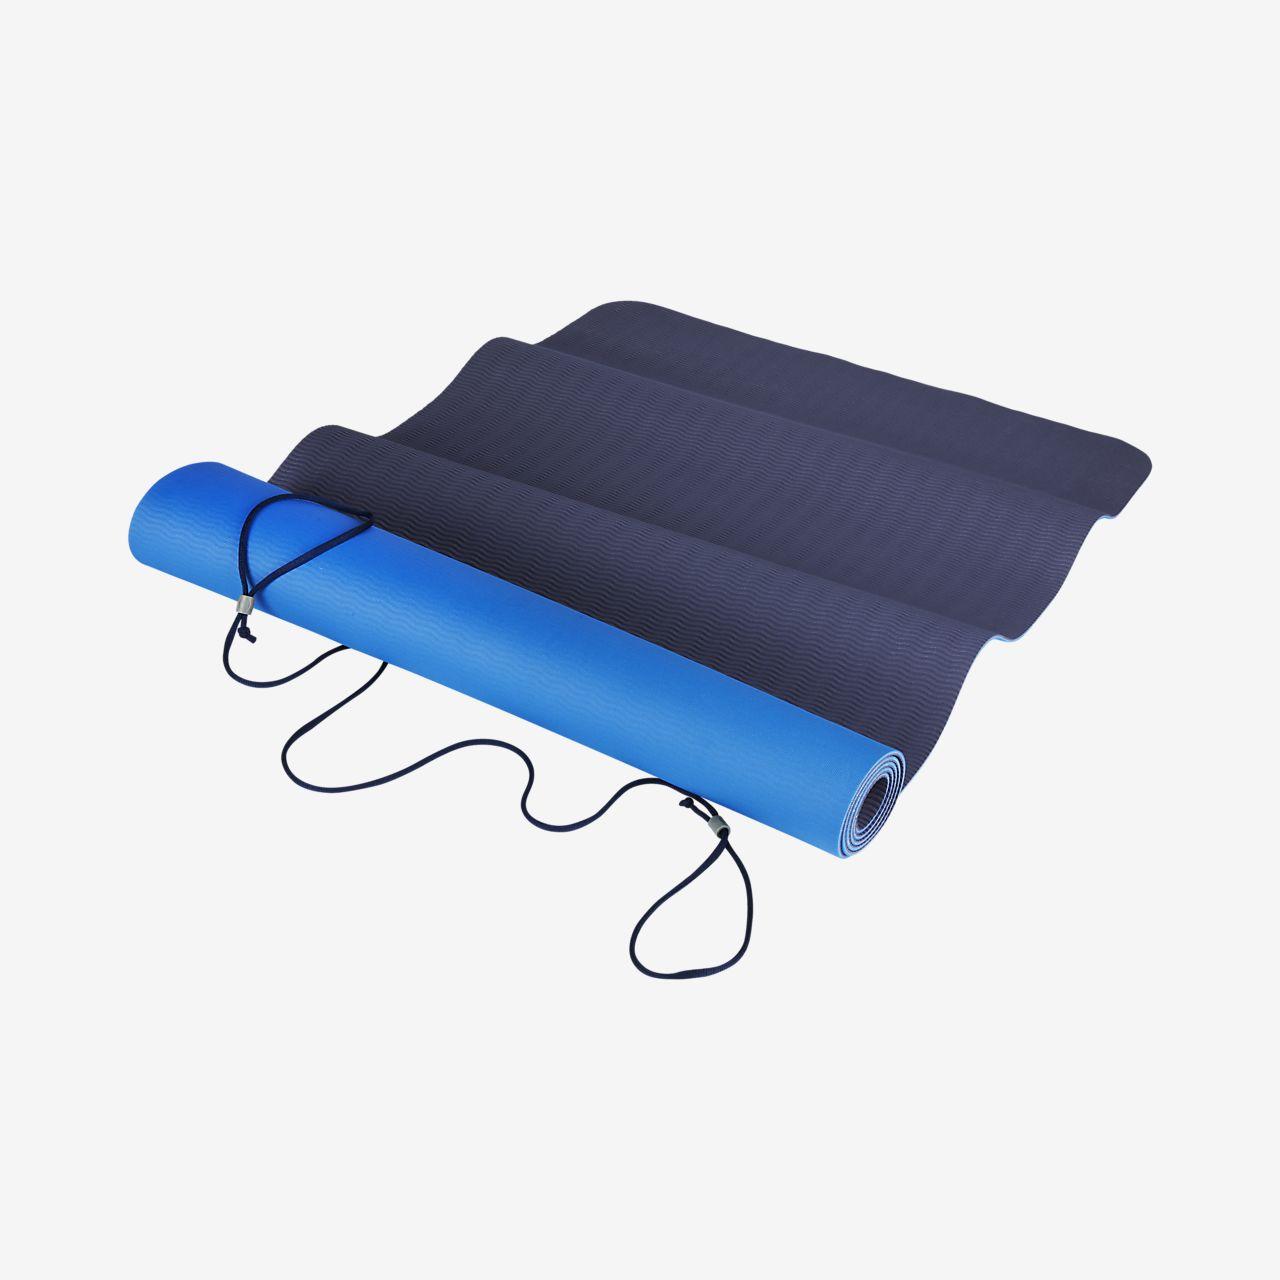 Tappetino da yoga 2.0 Nike JDI